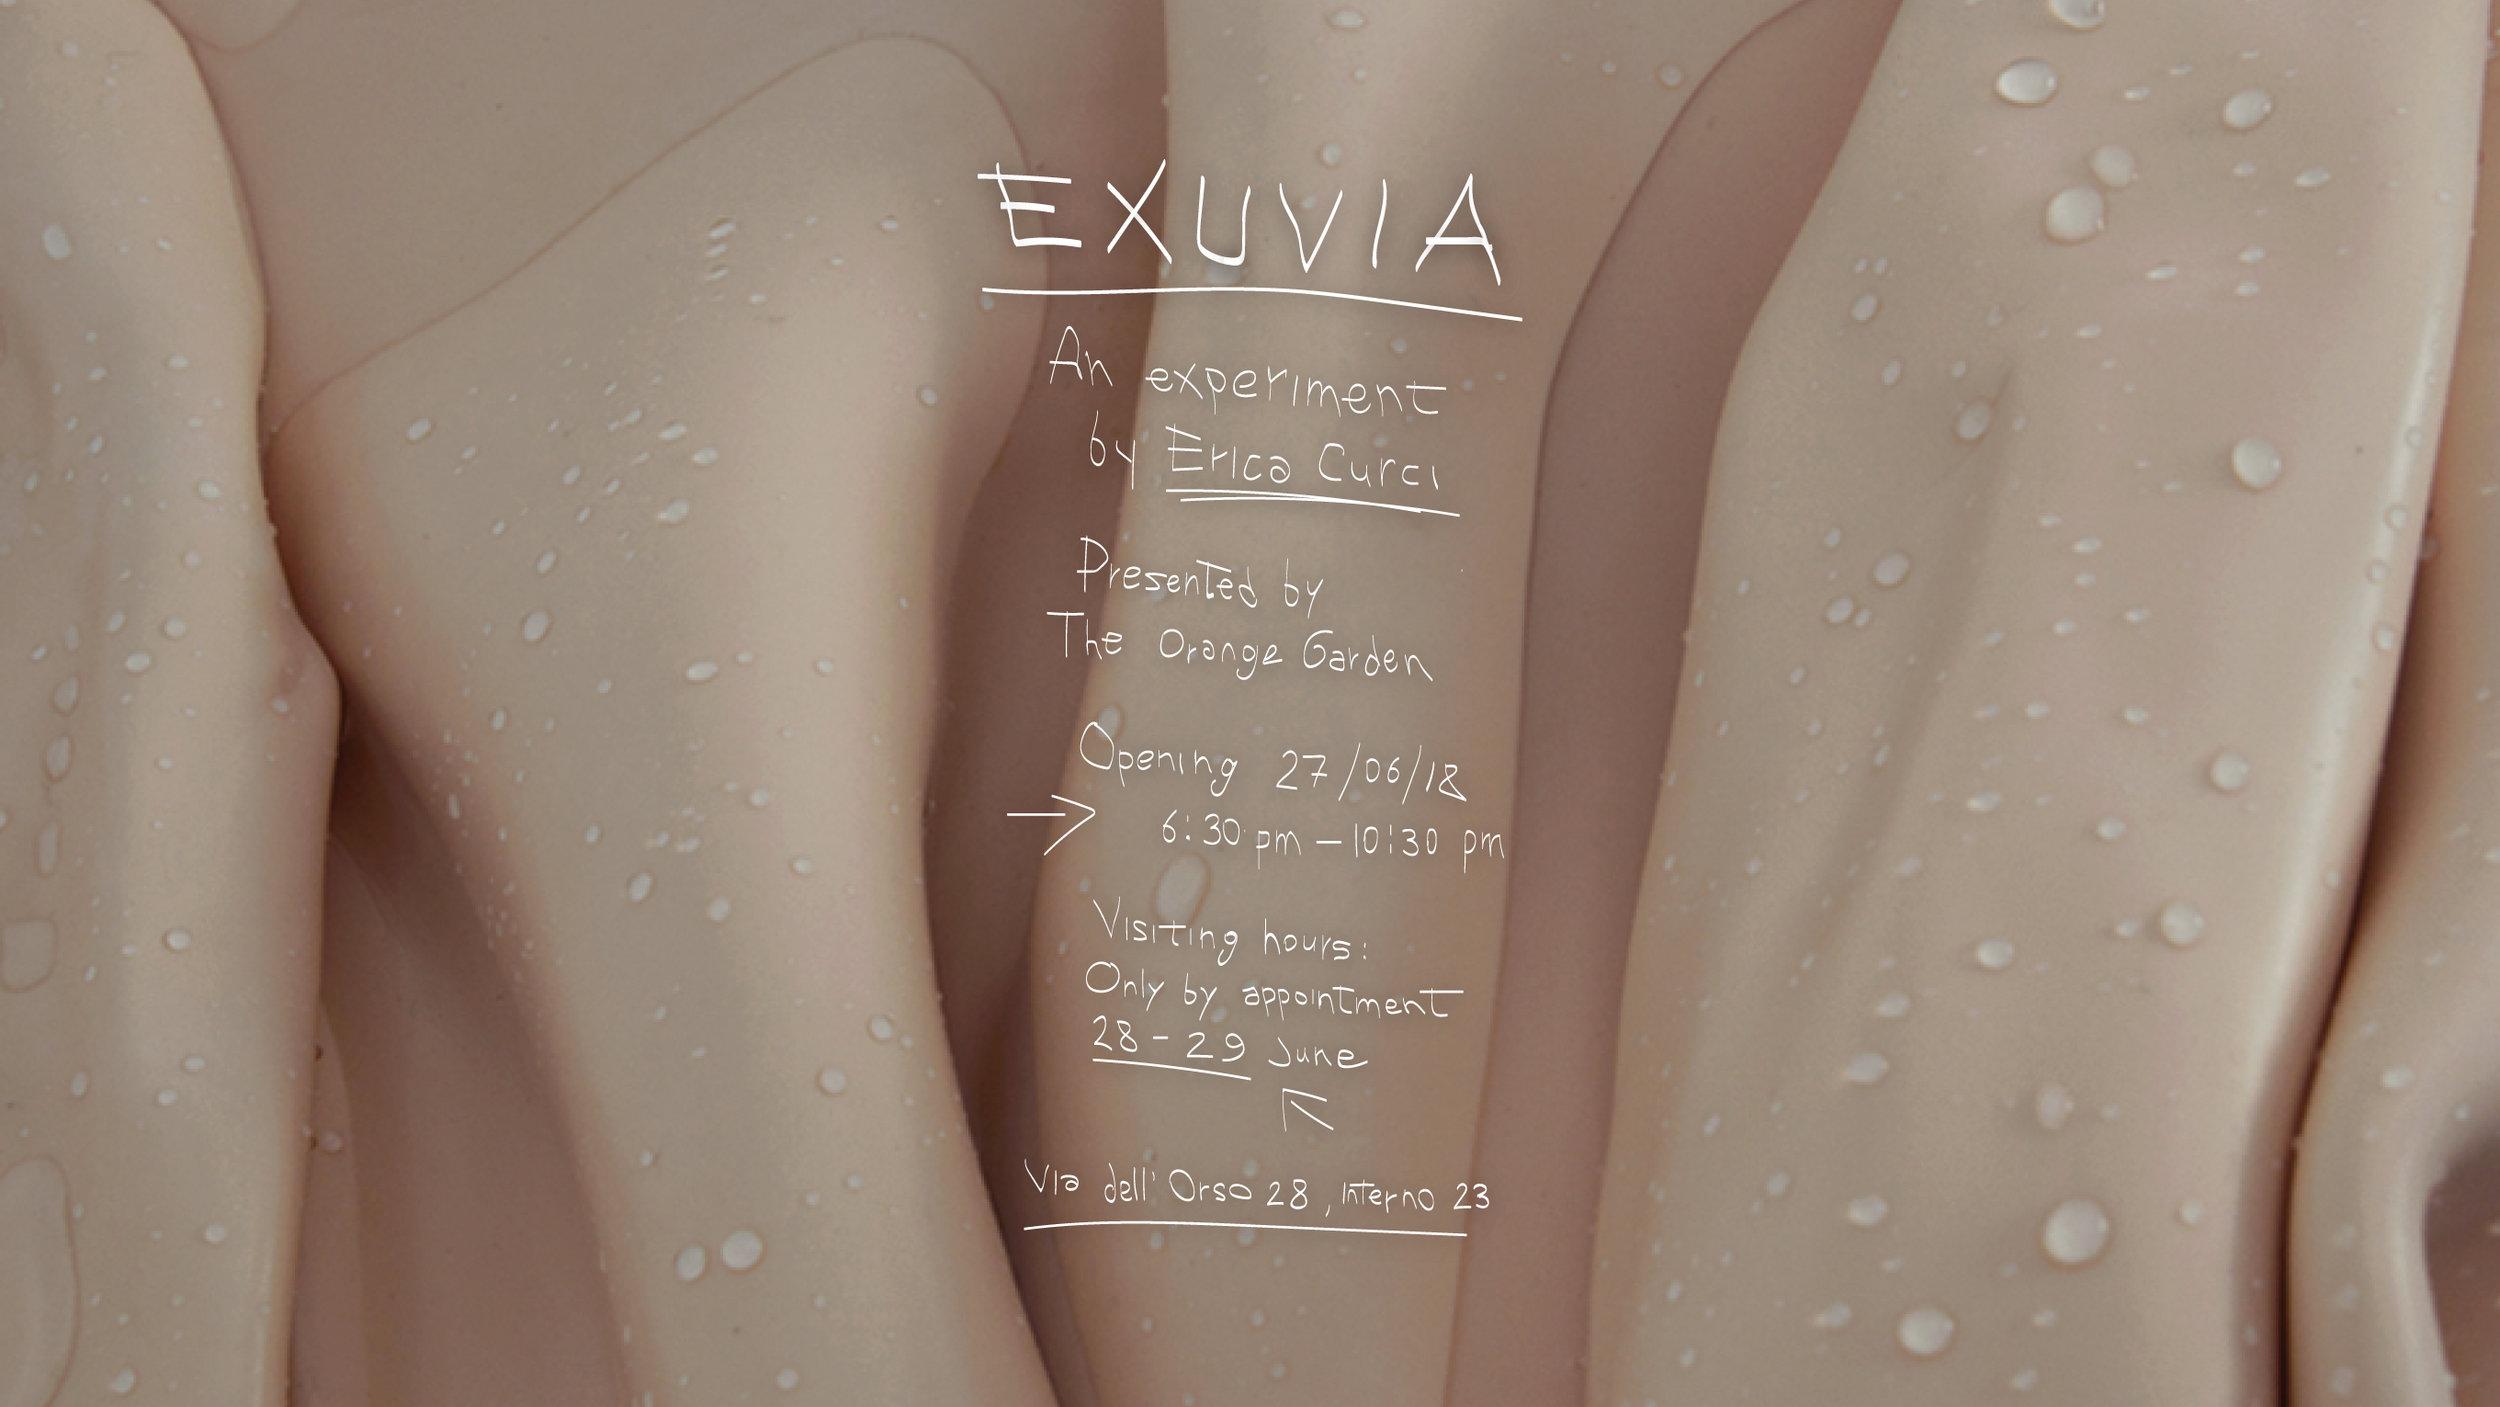 EXUVIA-LAST-ONE.jpg